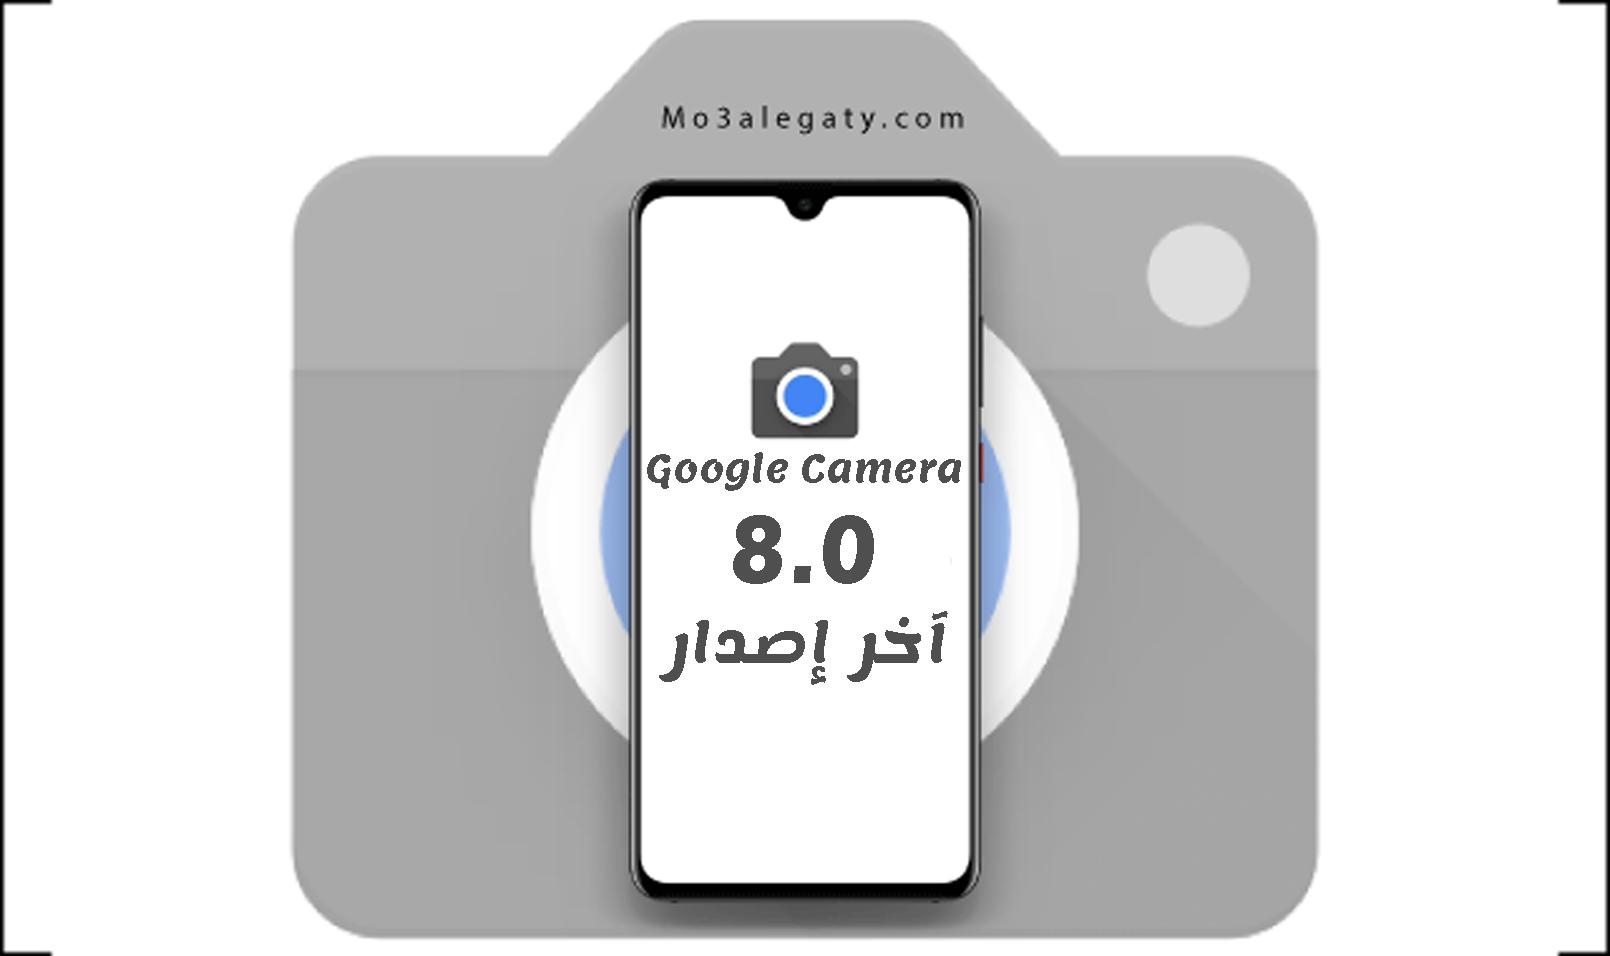 تحميل جوجل كاميرا اخر اصدار (Google Camera 8.0)